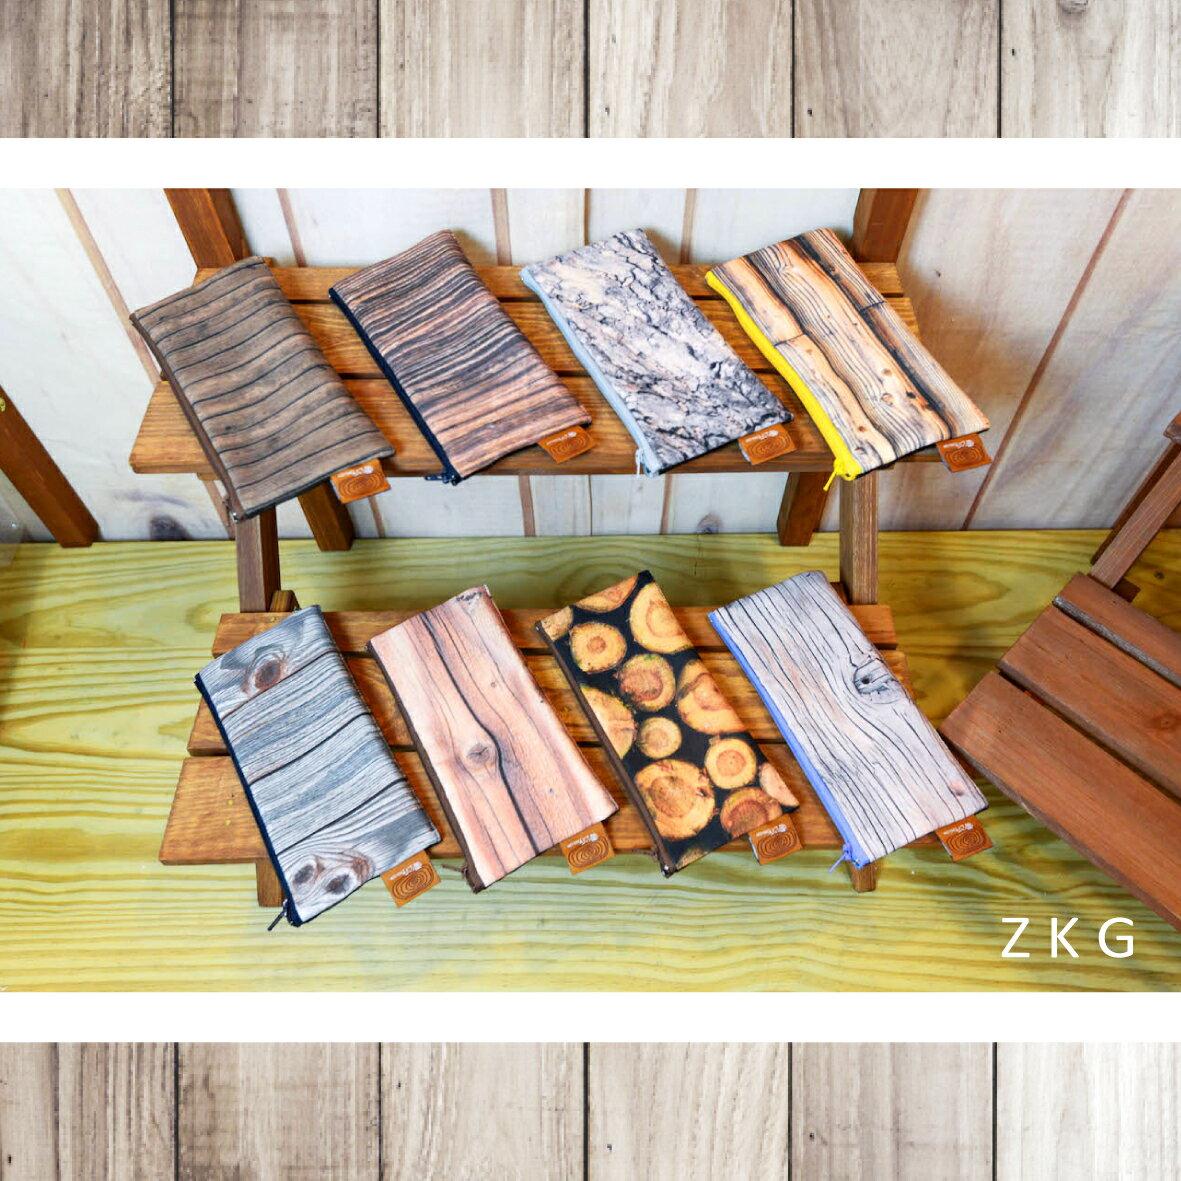 ZKG 木系列~網布扁形筆袋~單個入    製 ~送禮~自用~